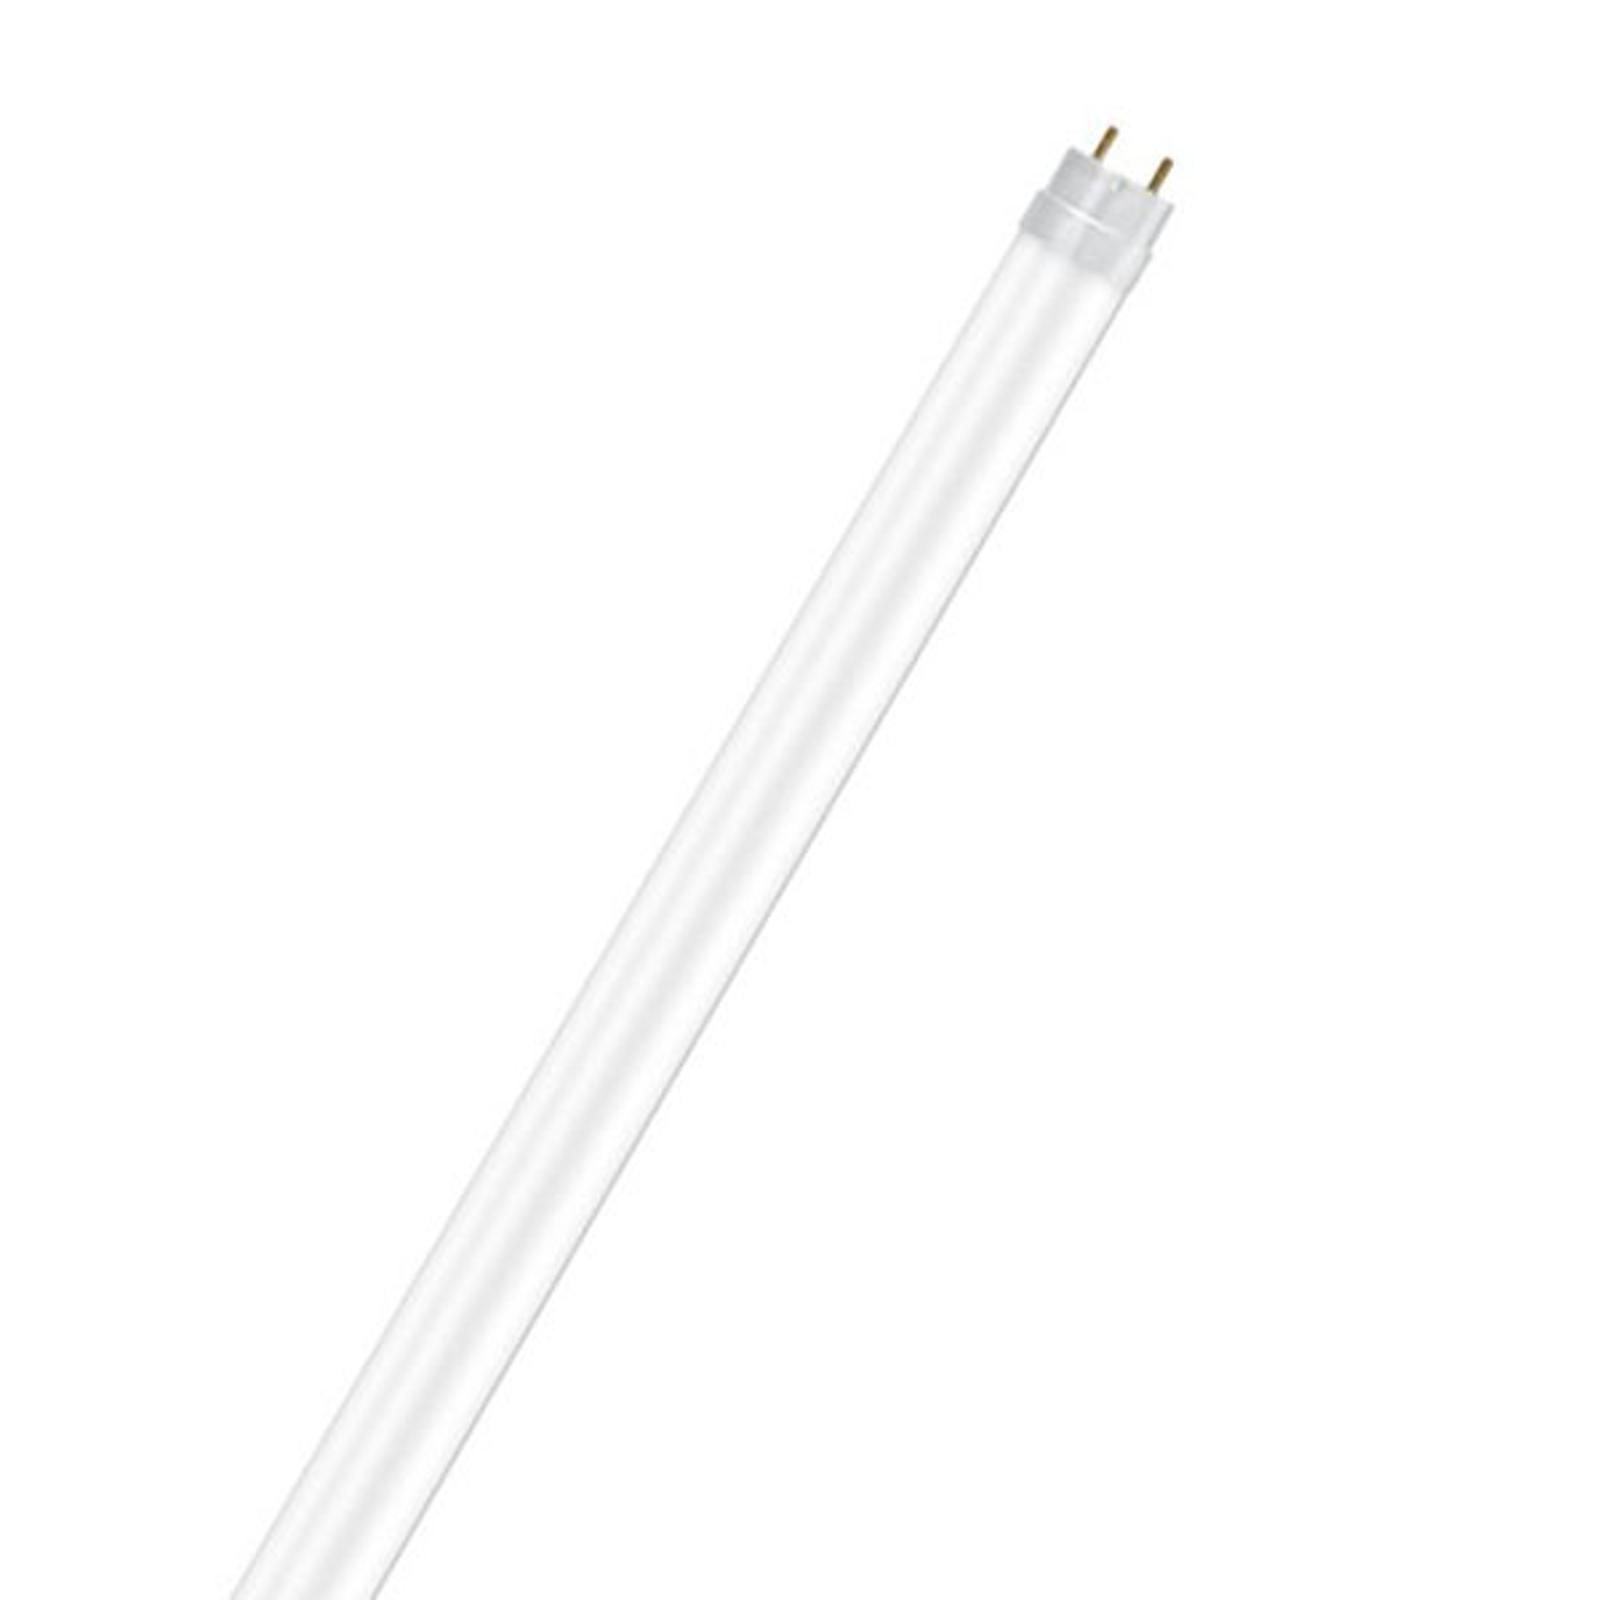 OSRAM LED-Röhre G13 150cm SubstiTUBE 20W 3000K